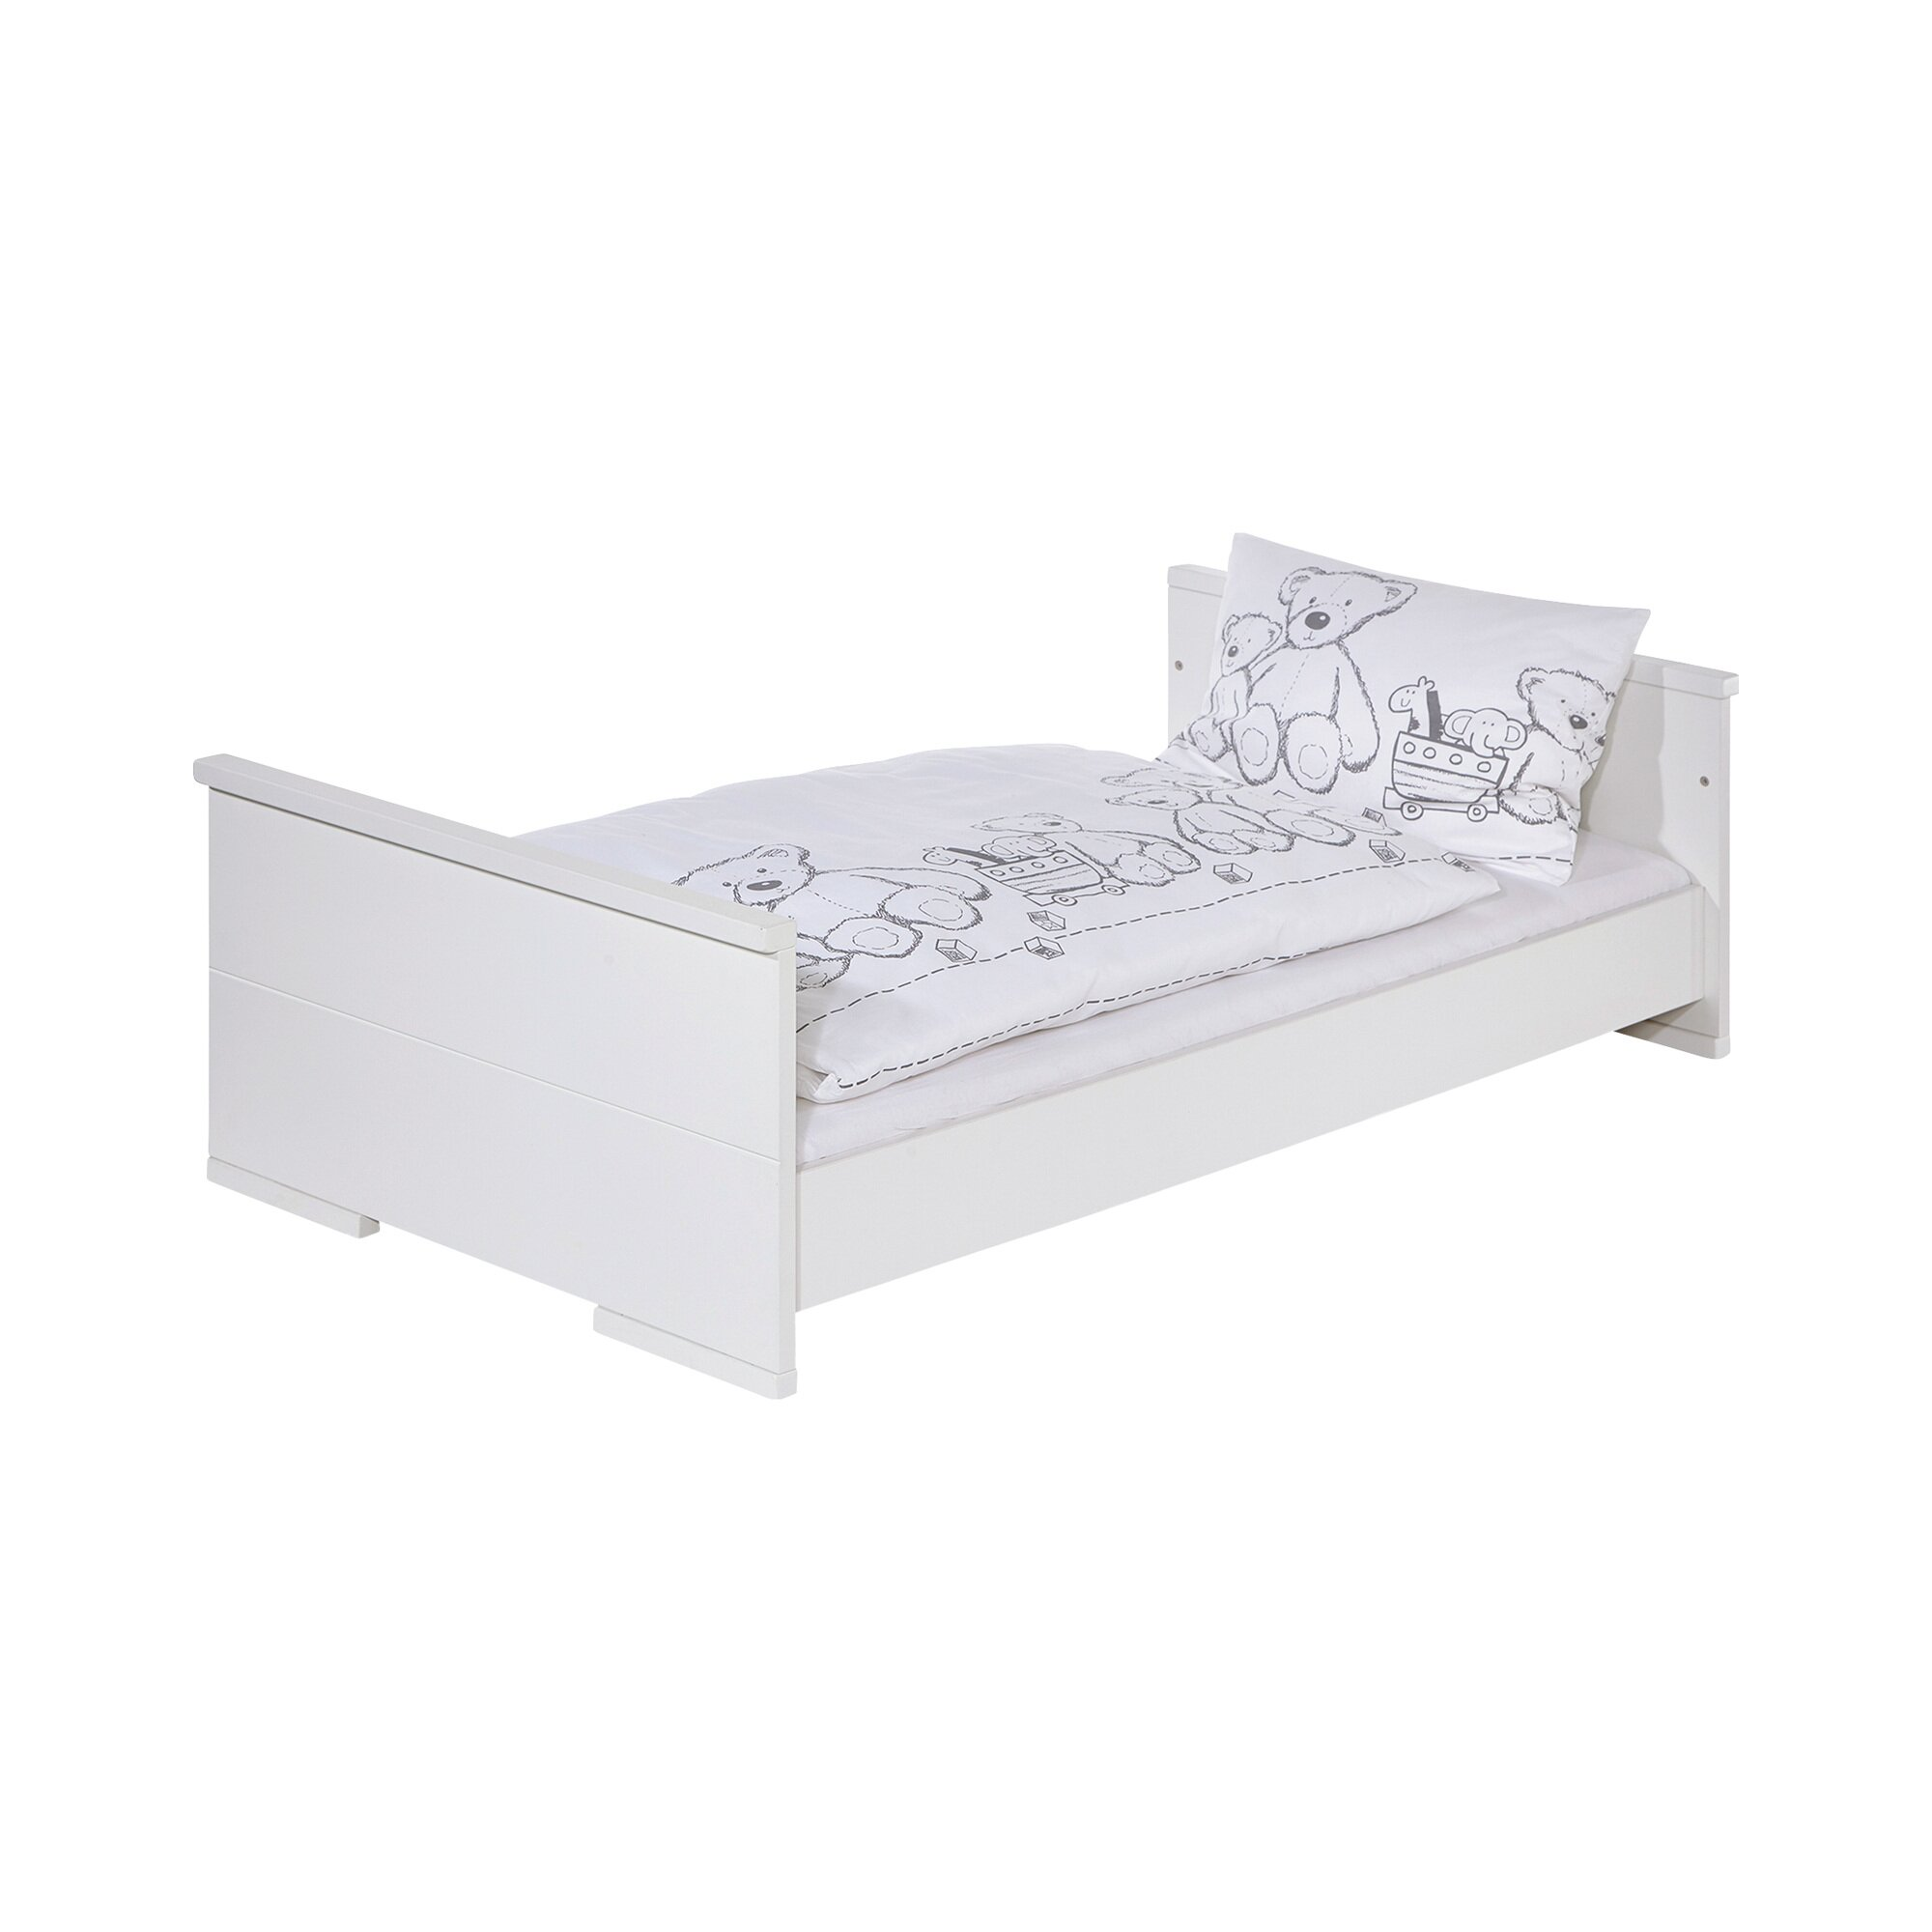 schardt-babybett-maxx-white-70x140